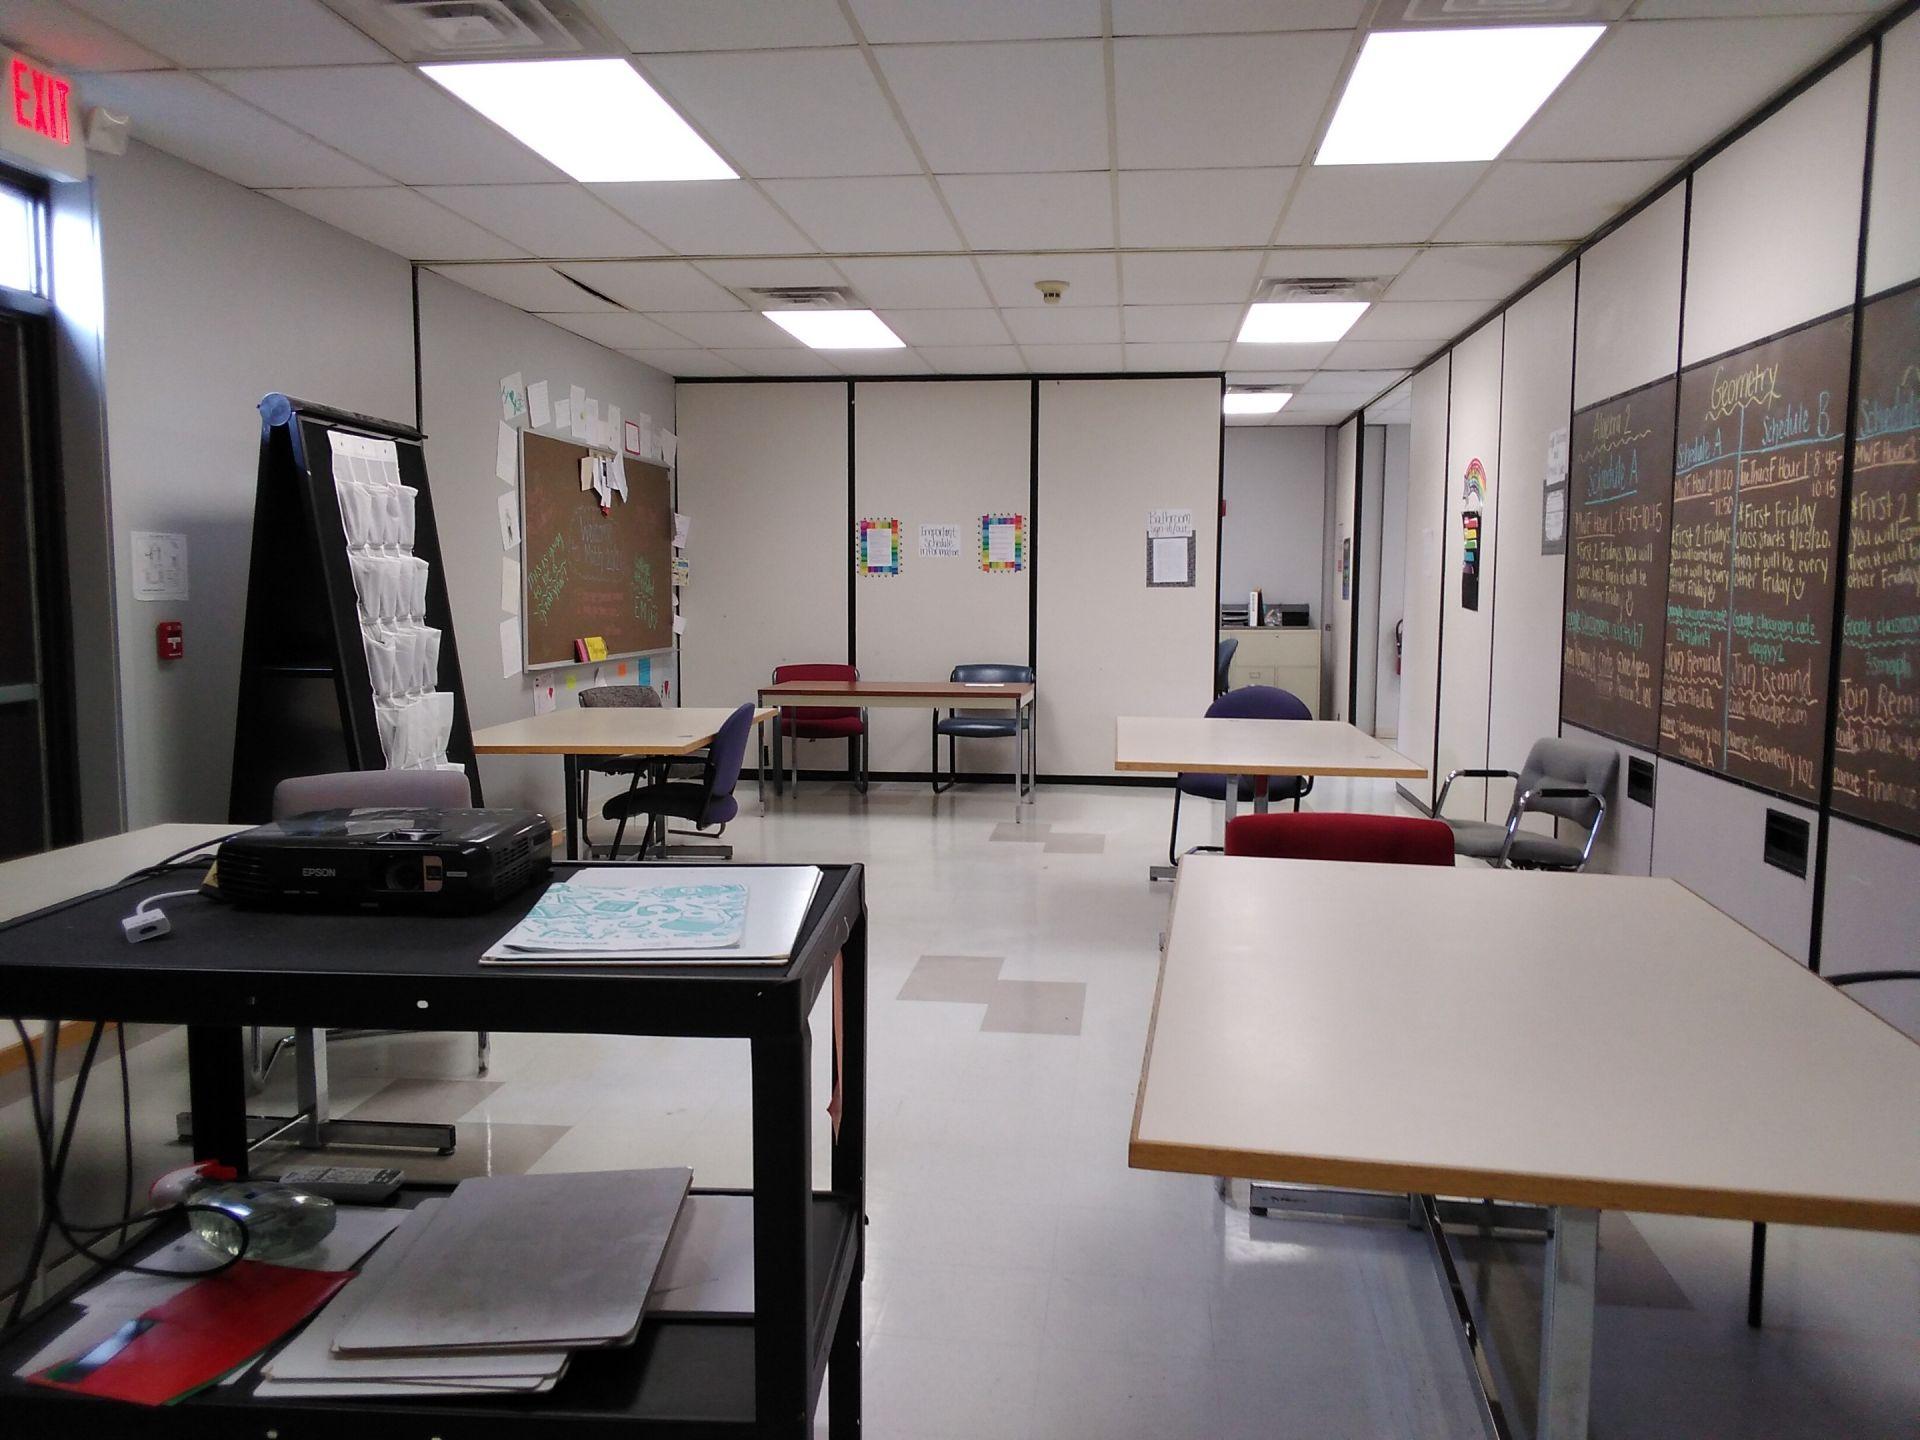 Math classroom